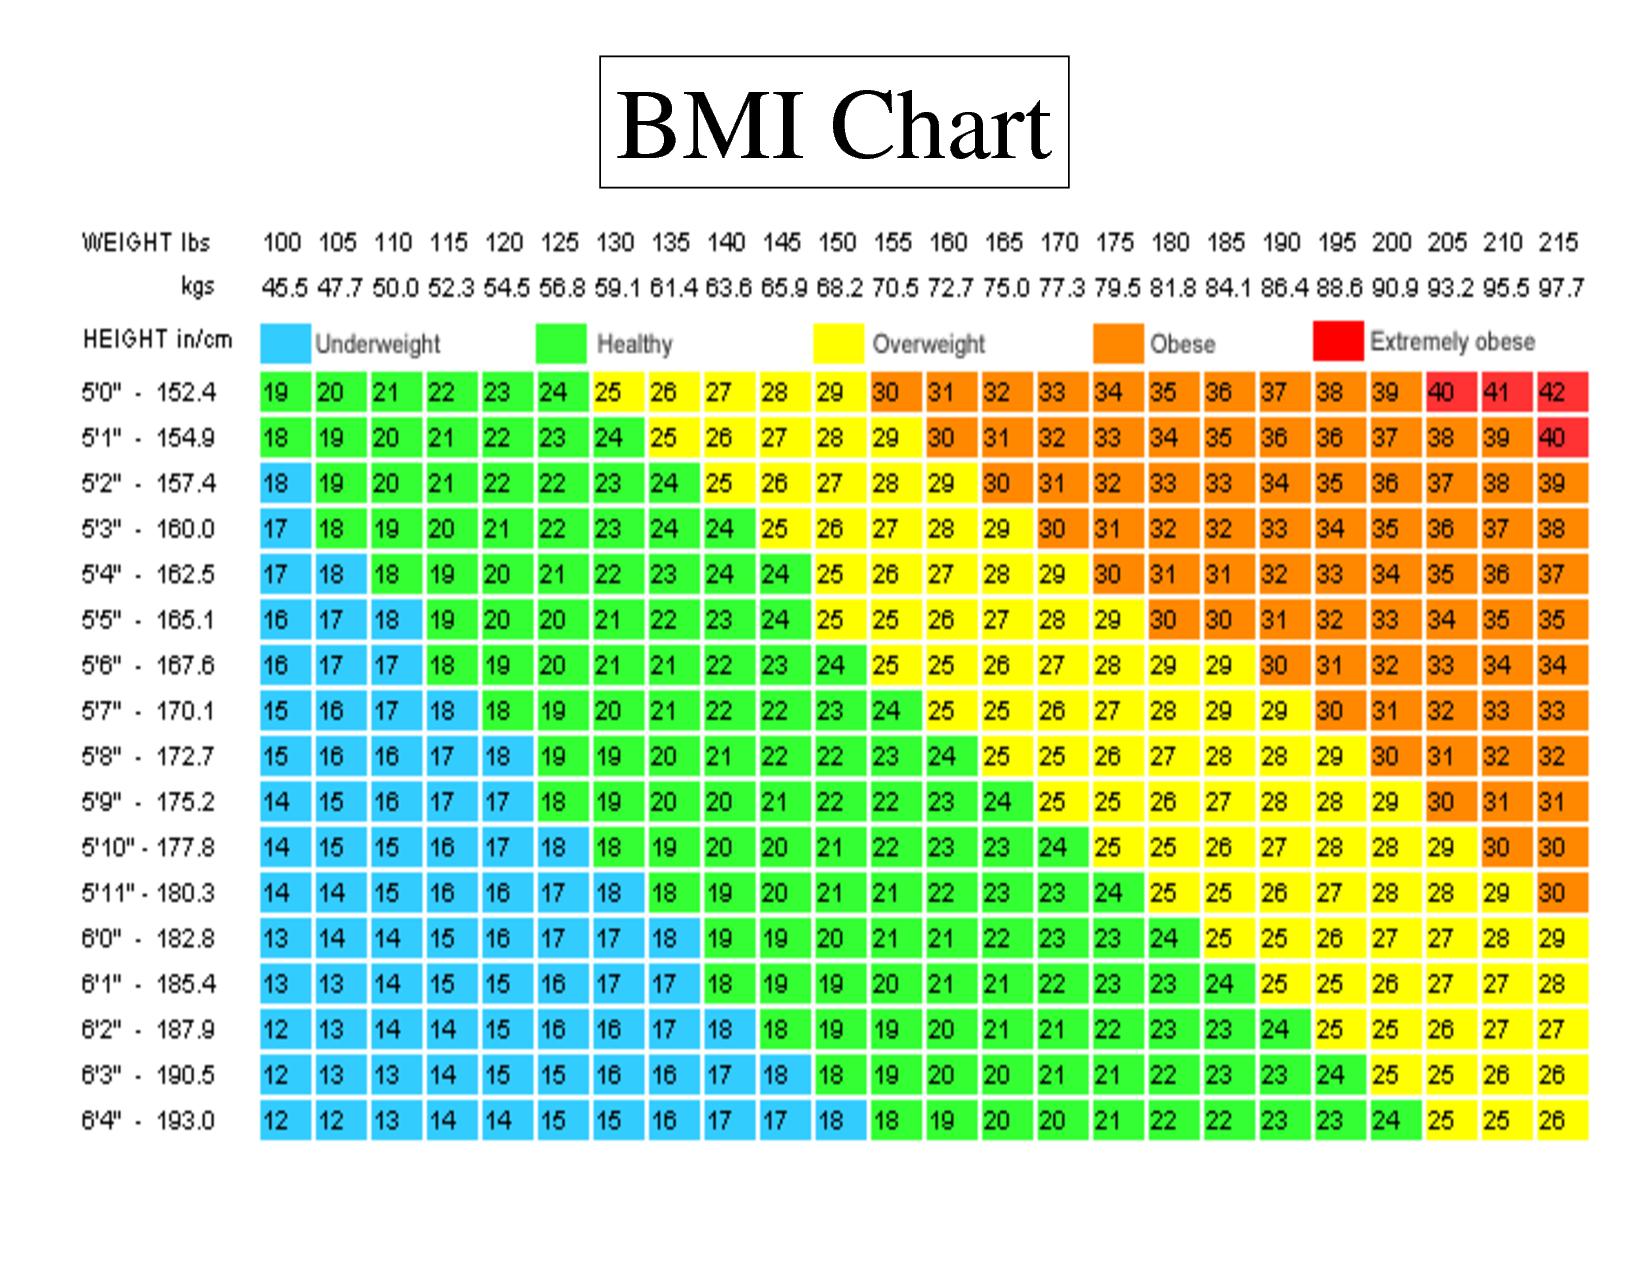 Newbie needing help with ideal weight charts diabetes forum bmi chartg nvjuhfo Choice Image